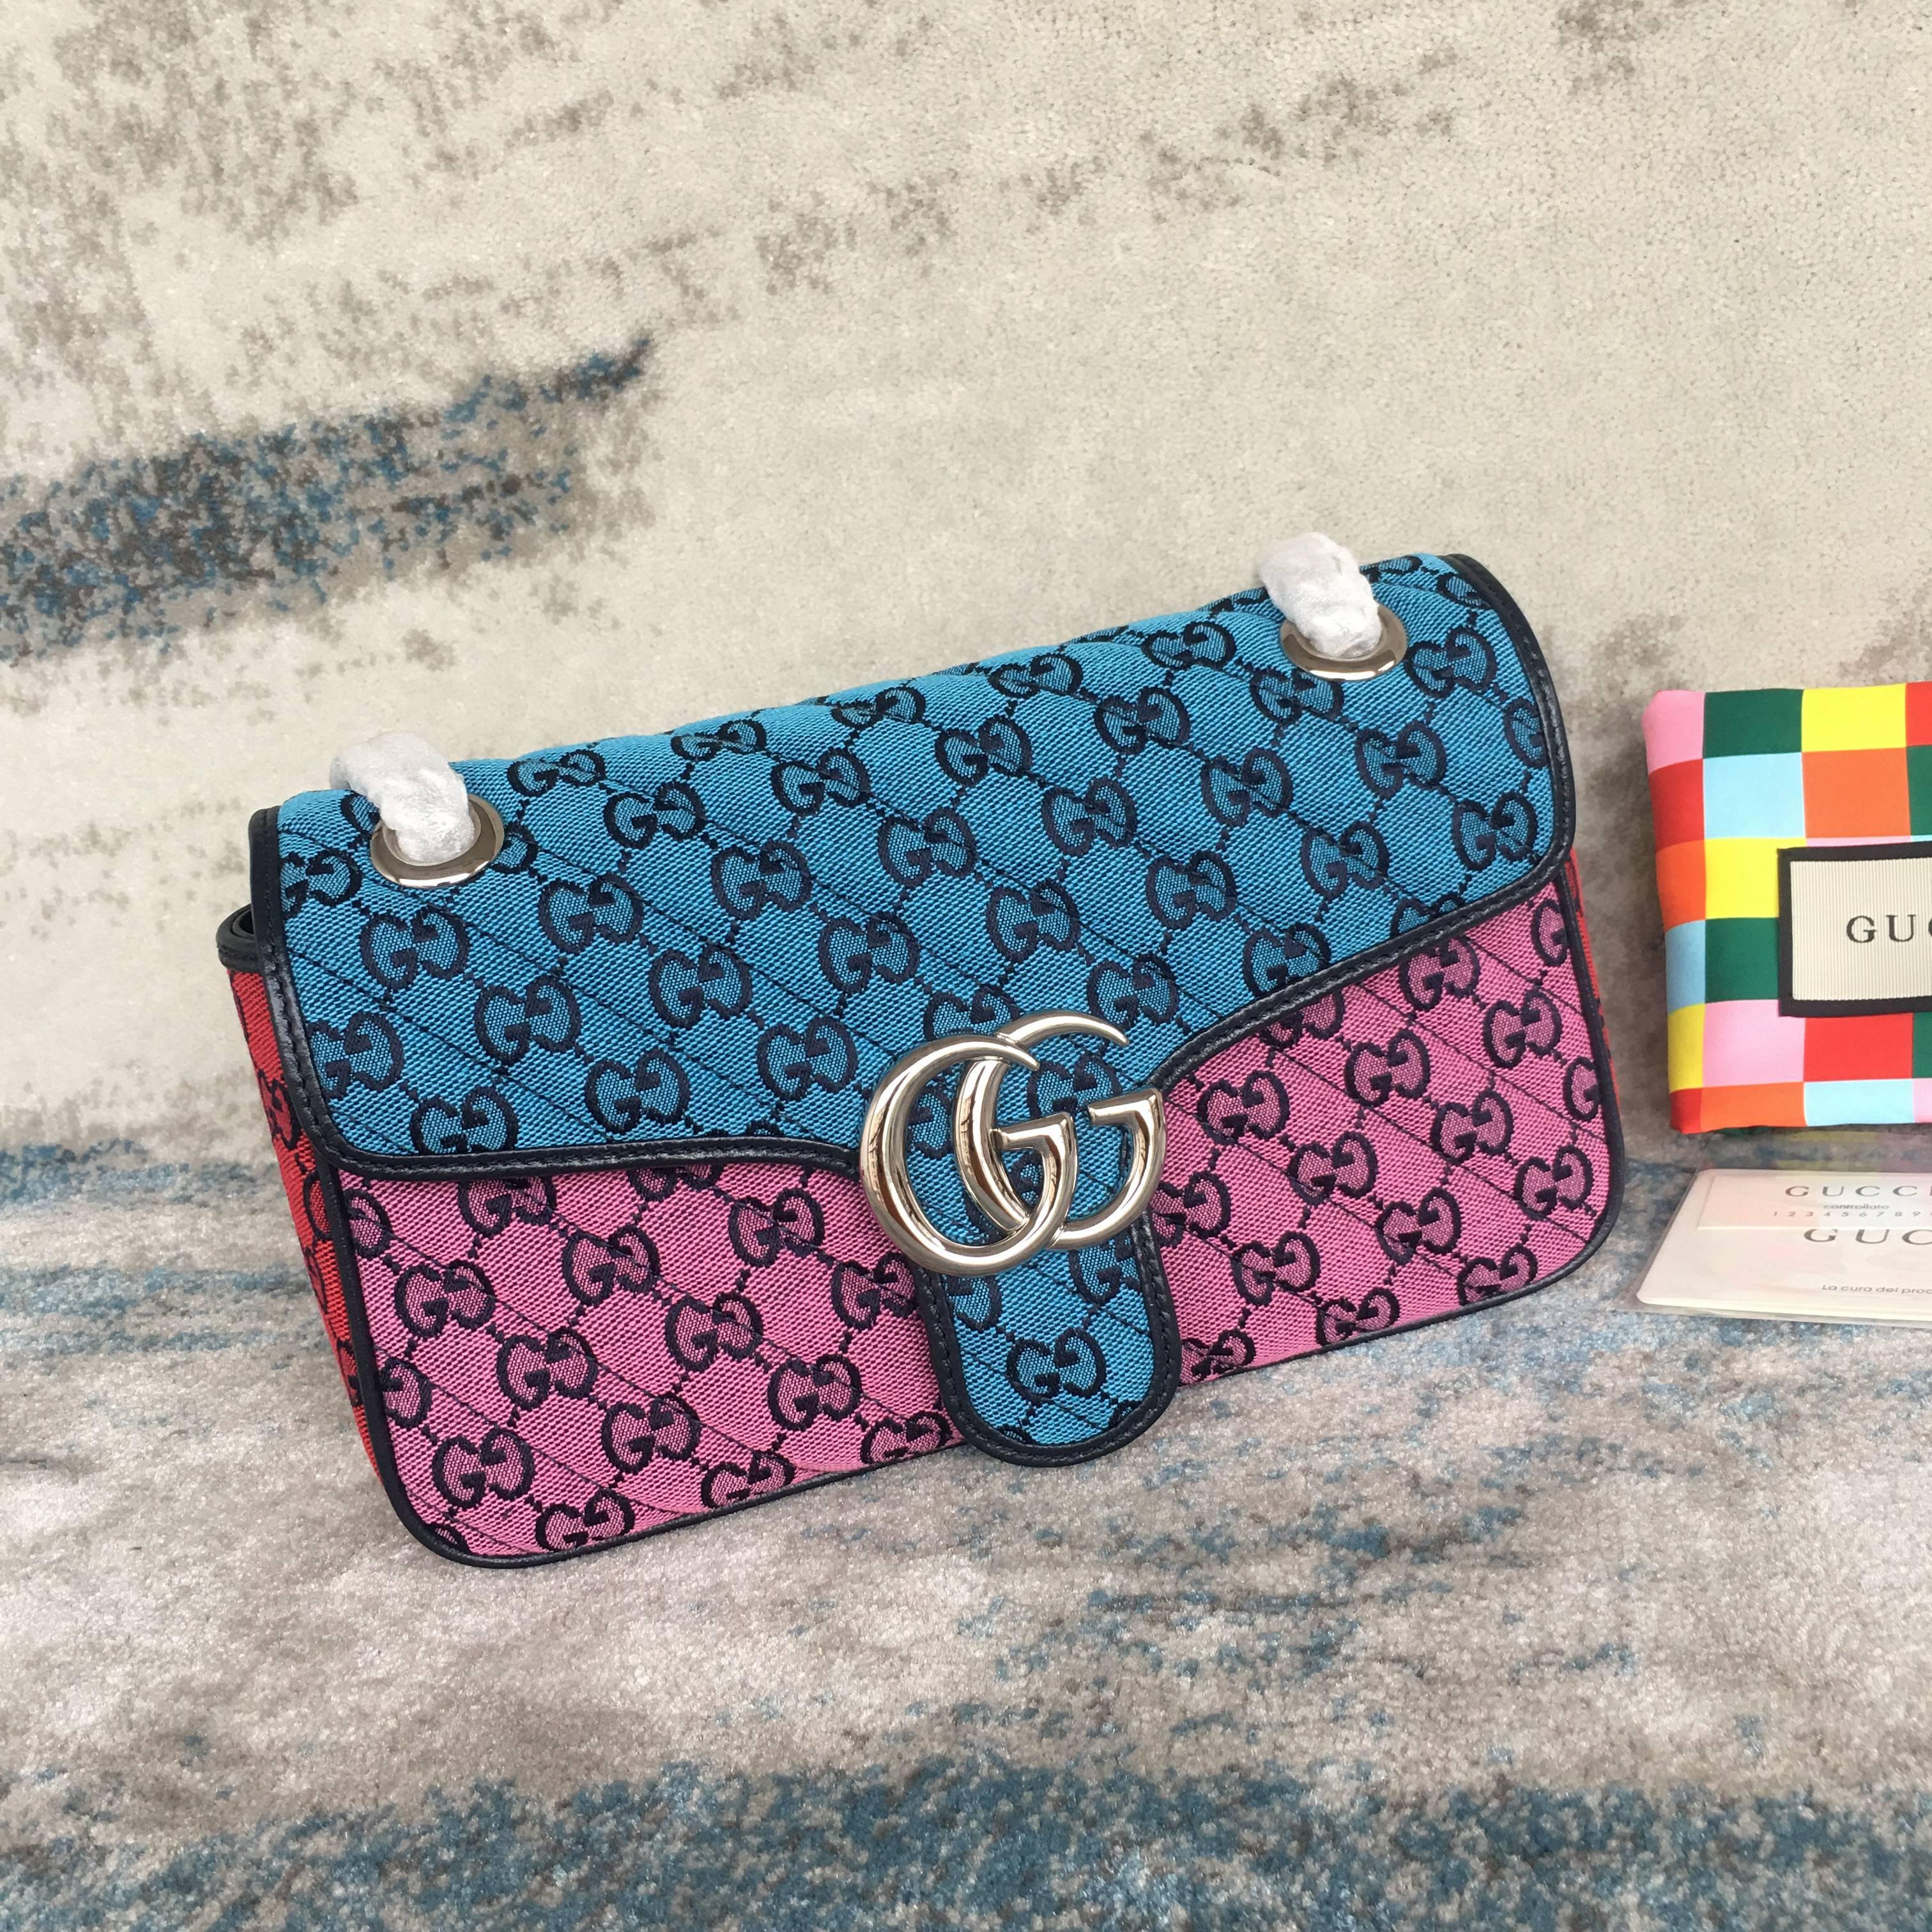 Gucci Marmont Multicolor small shoulder bag 443497